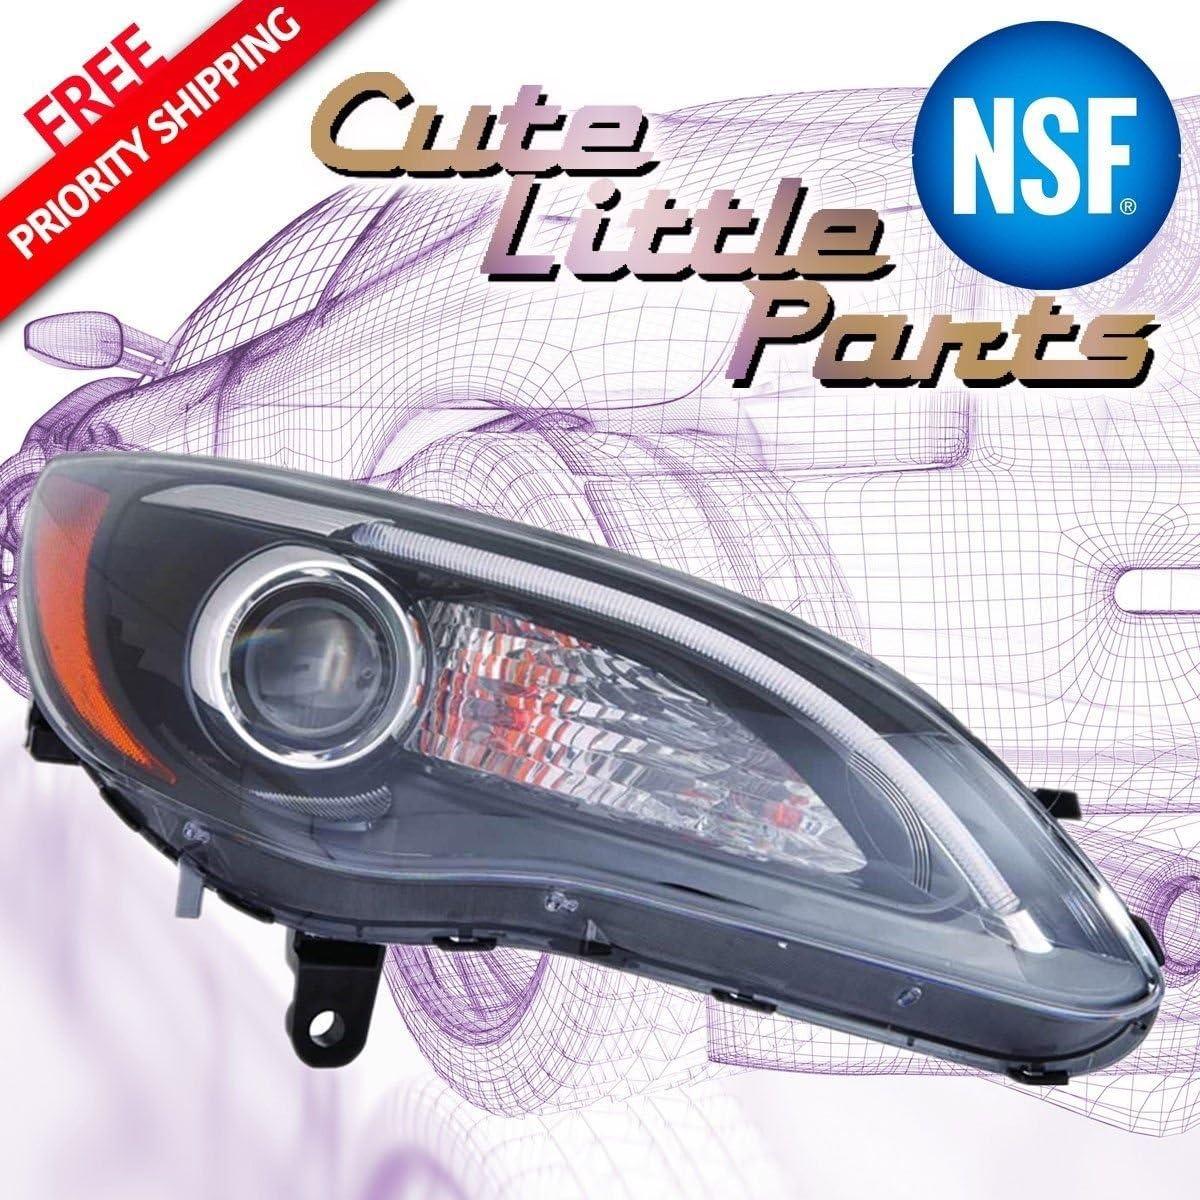 S MODEL PASSENGER SIDE NSF Depo 333-1192R-AFN7 Head Lamp Assembly